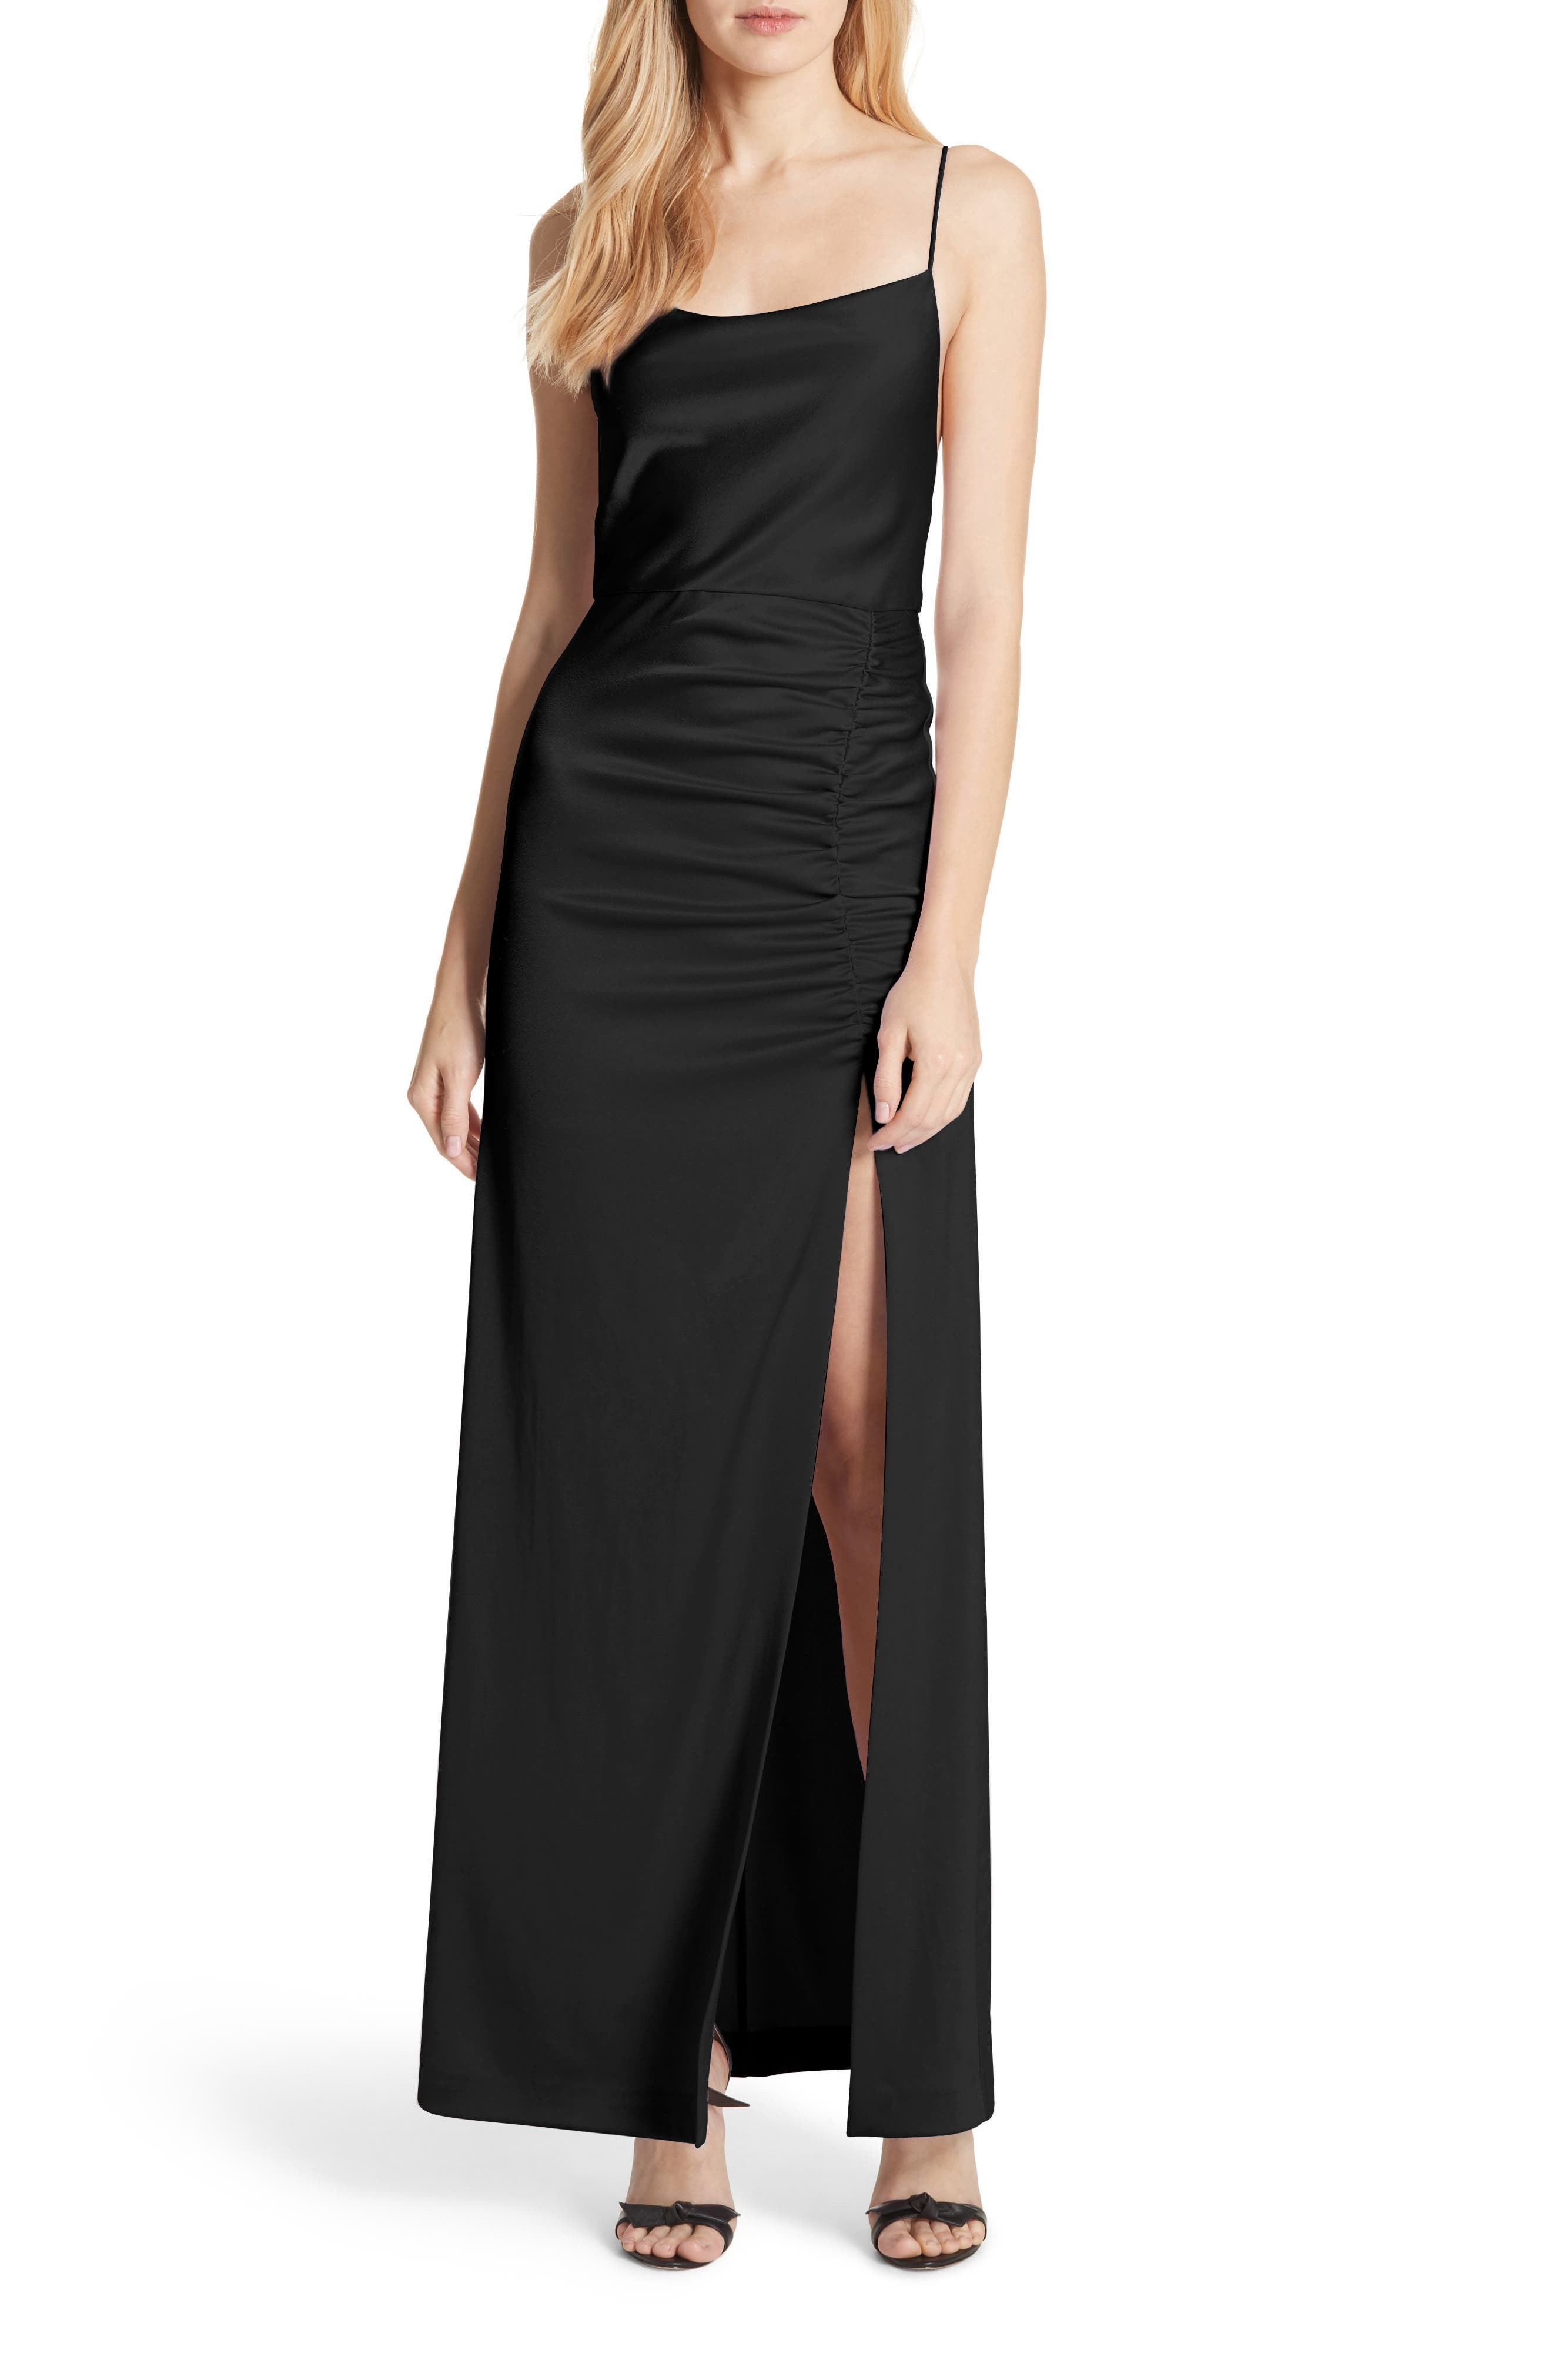 Diana Slit Front Maxi Dress,                         Main,                         color, Black